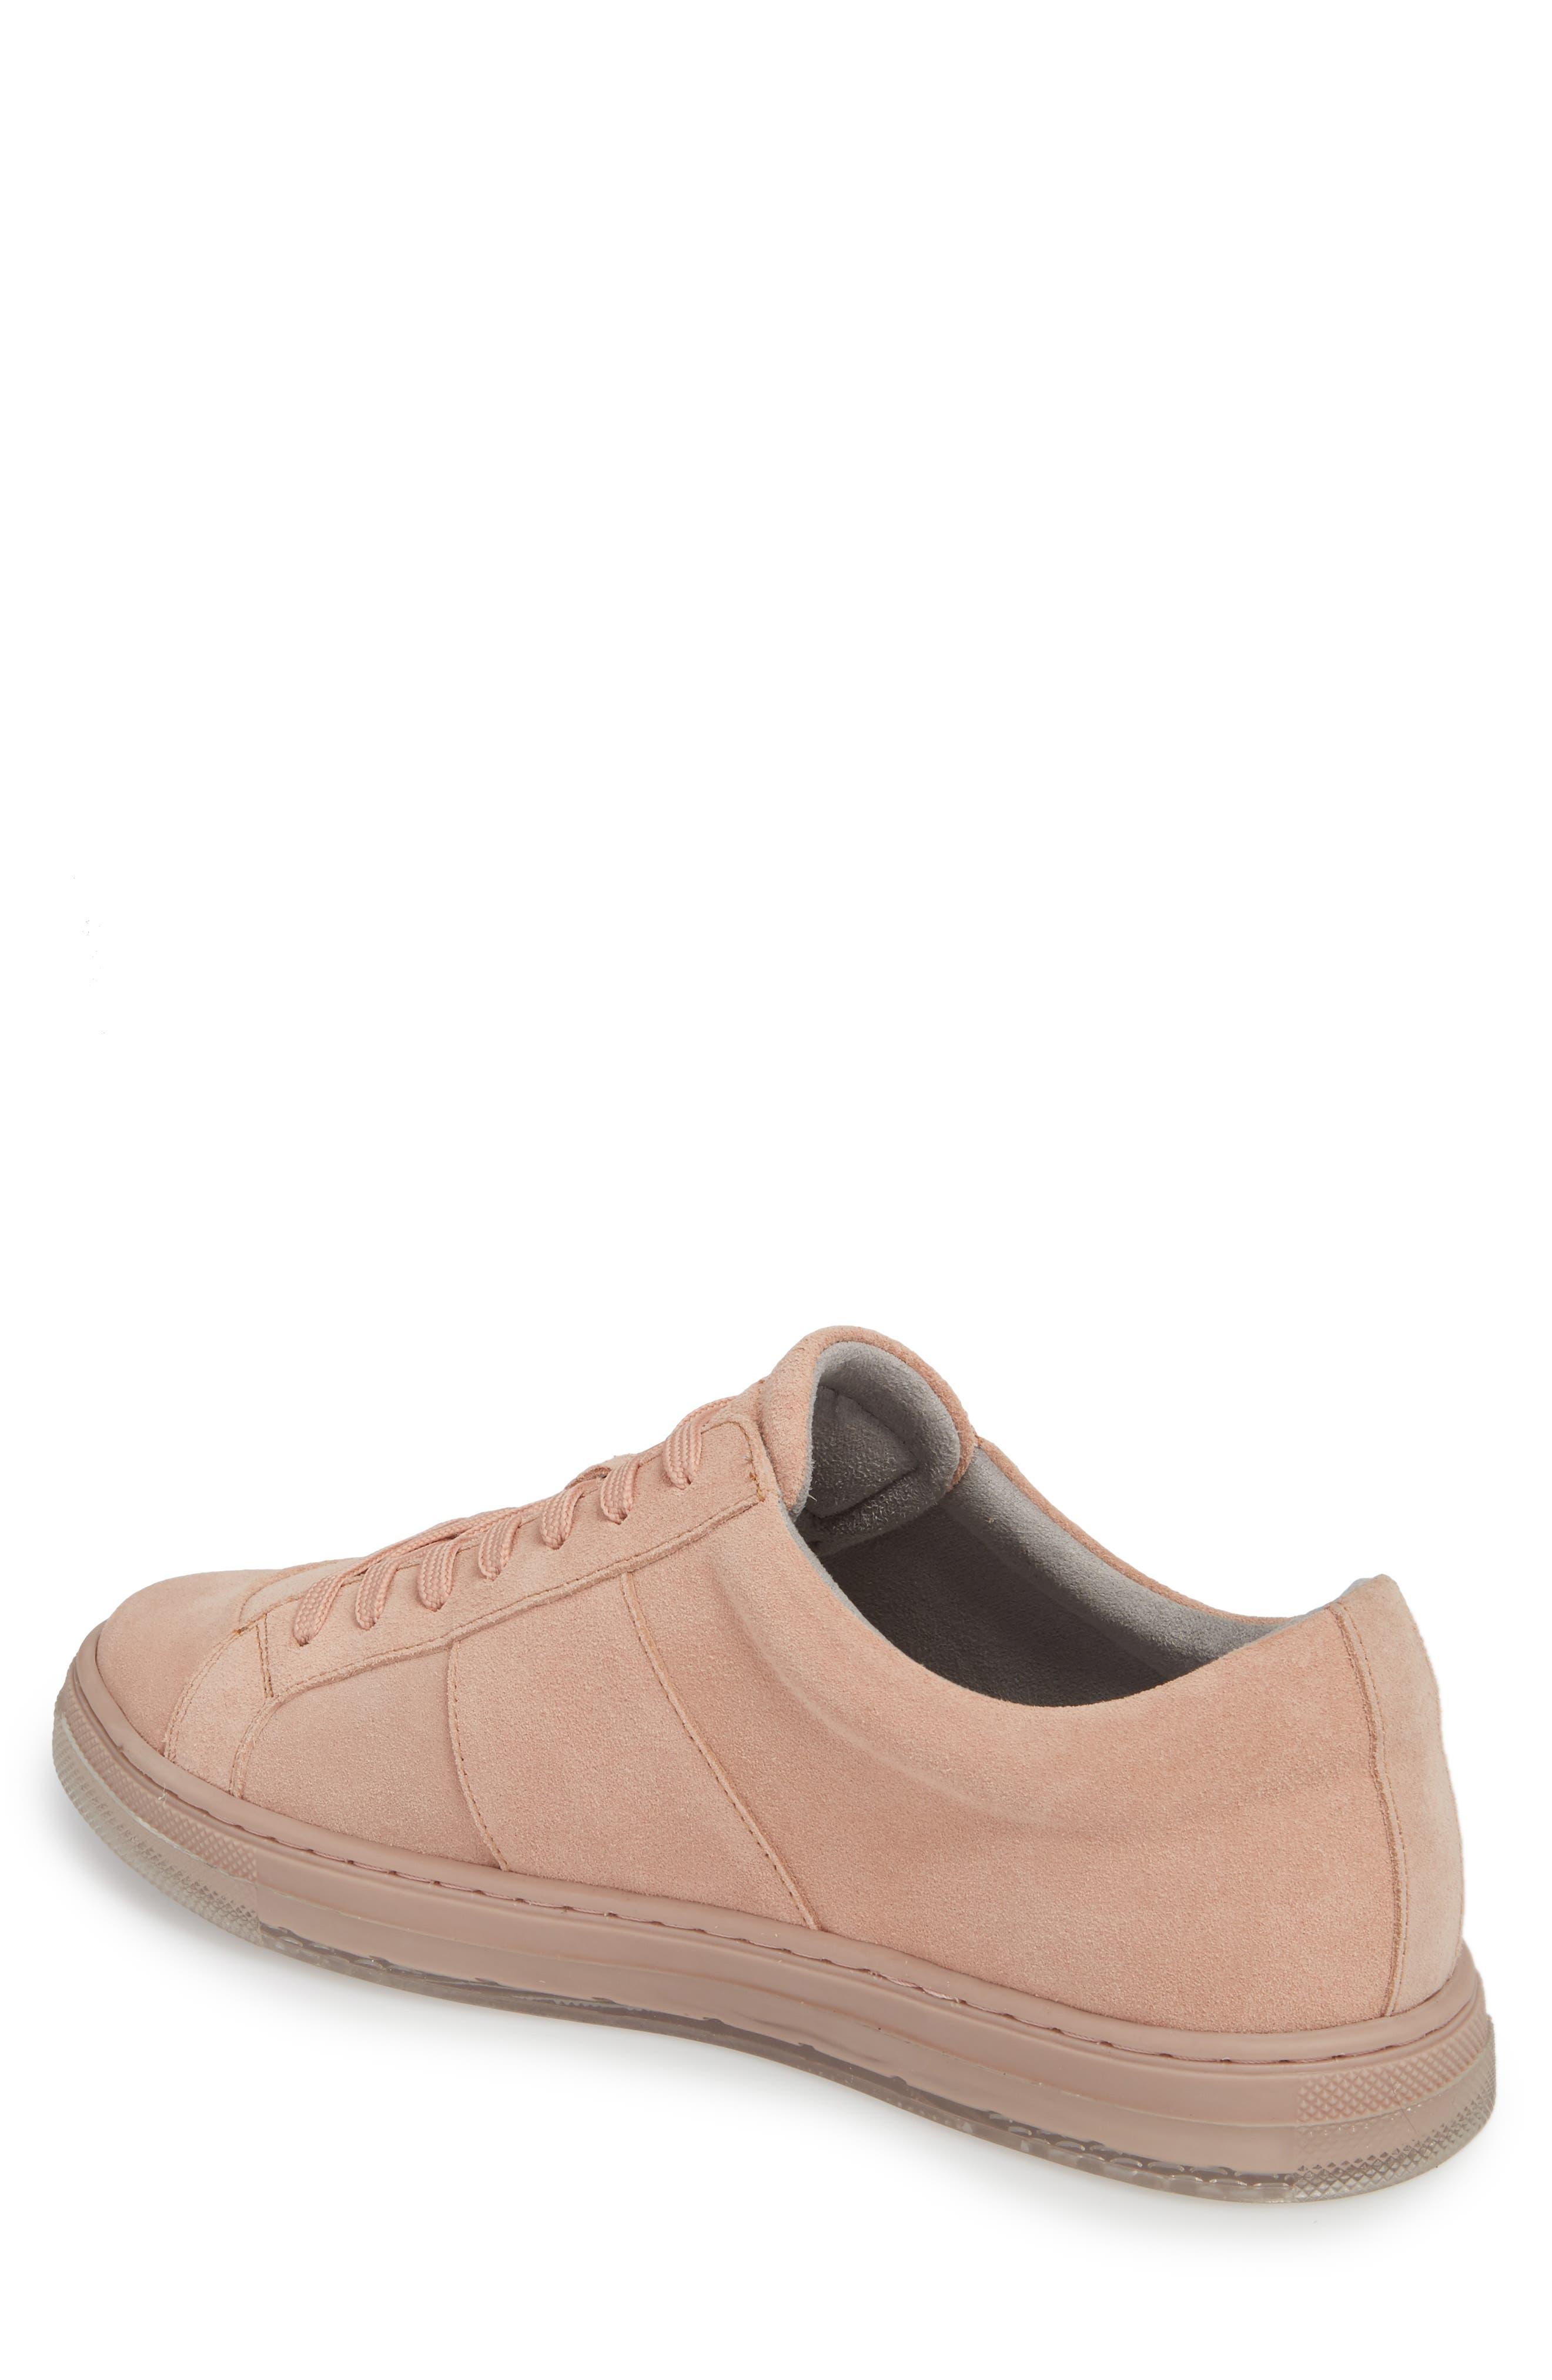 Colvin Sneaker,                             Alternate thumbnail 2, color,                             Rose Suede